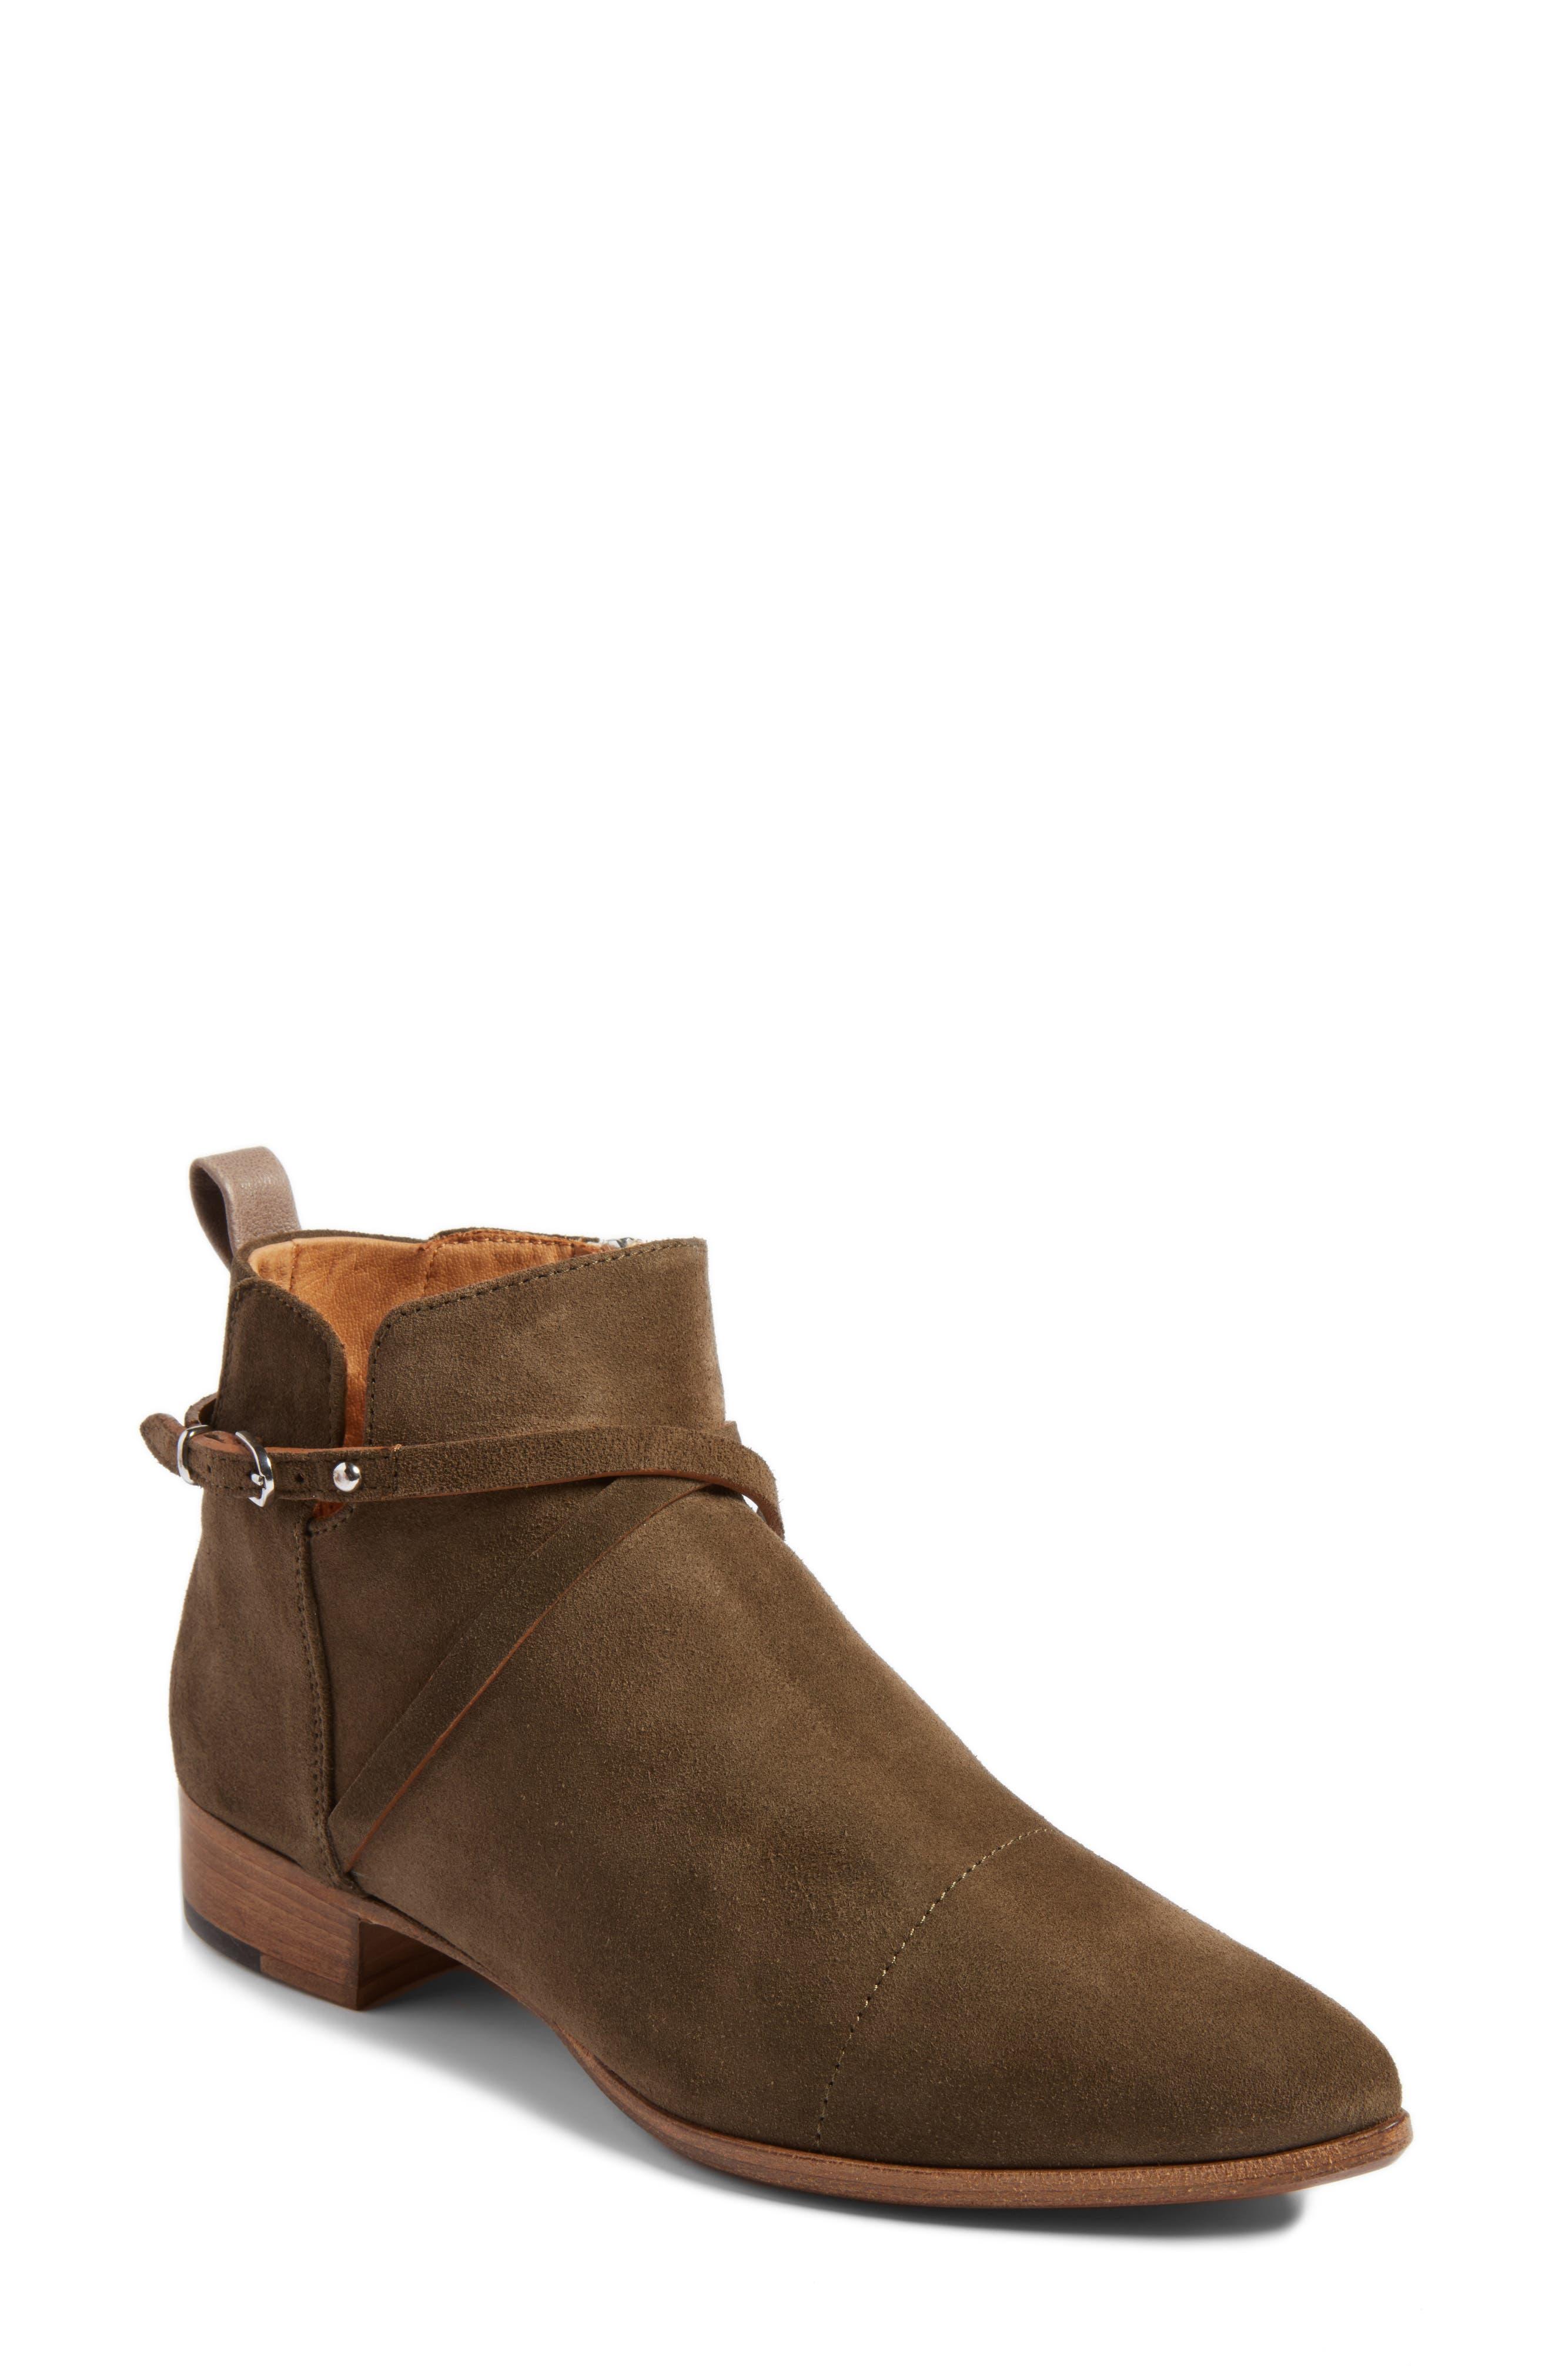 Main Image - Alberto Fermani 'Mea' Ankle Boot (Women) (Nordstrom Exclusive)